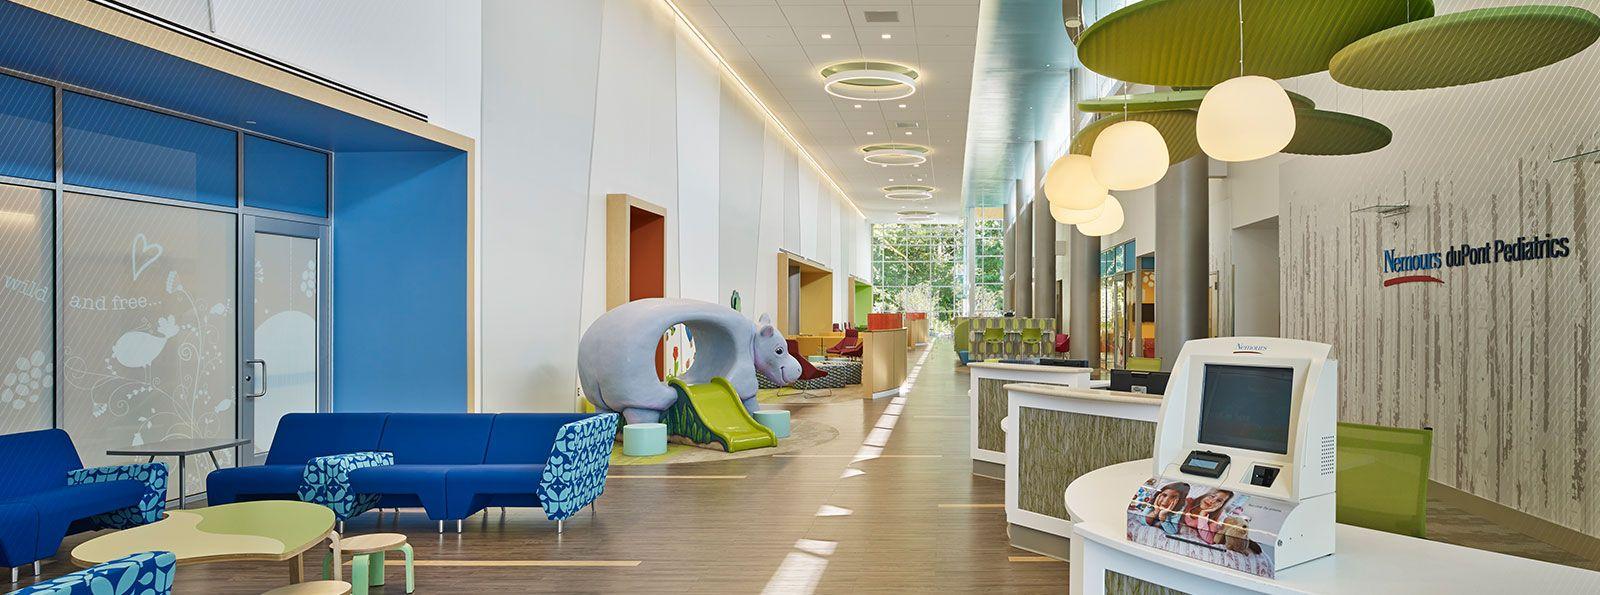 Pediatric Outpatient and Surgery Center Surgery center